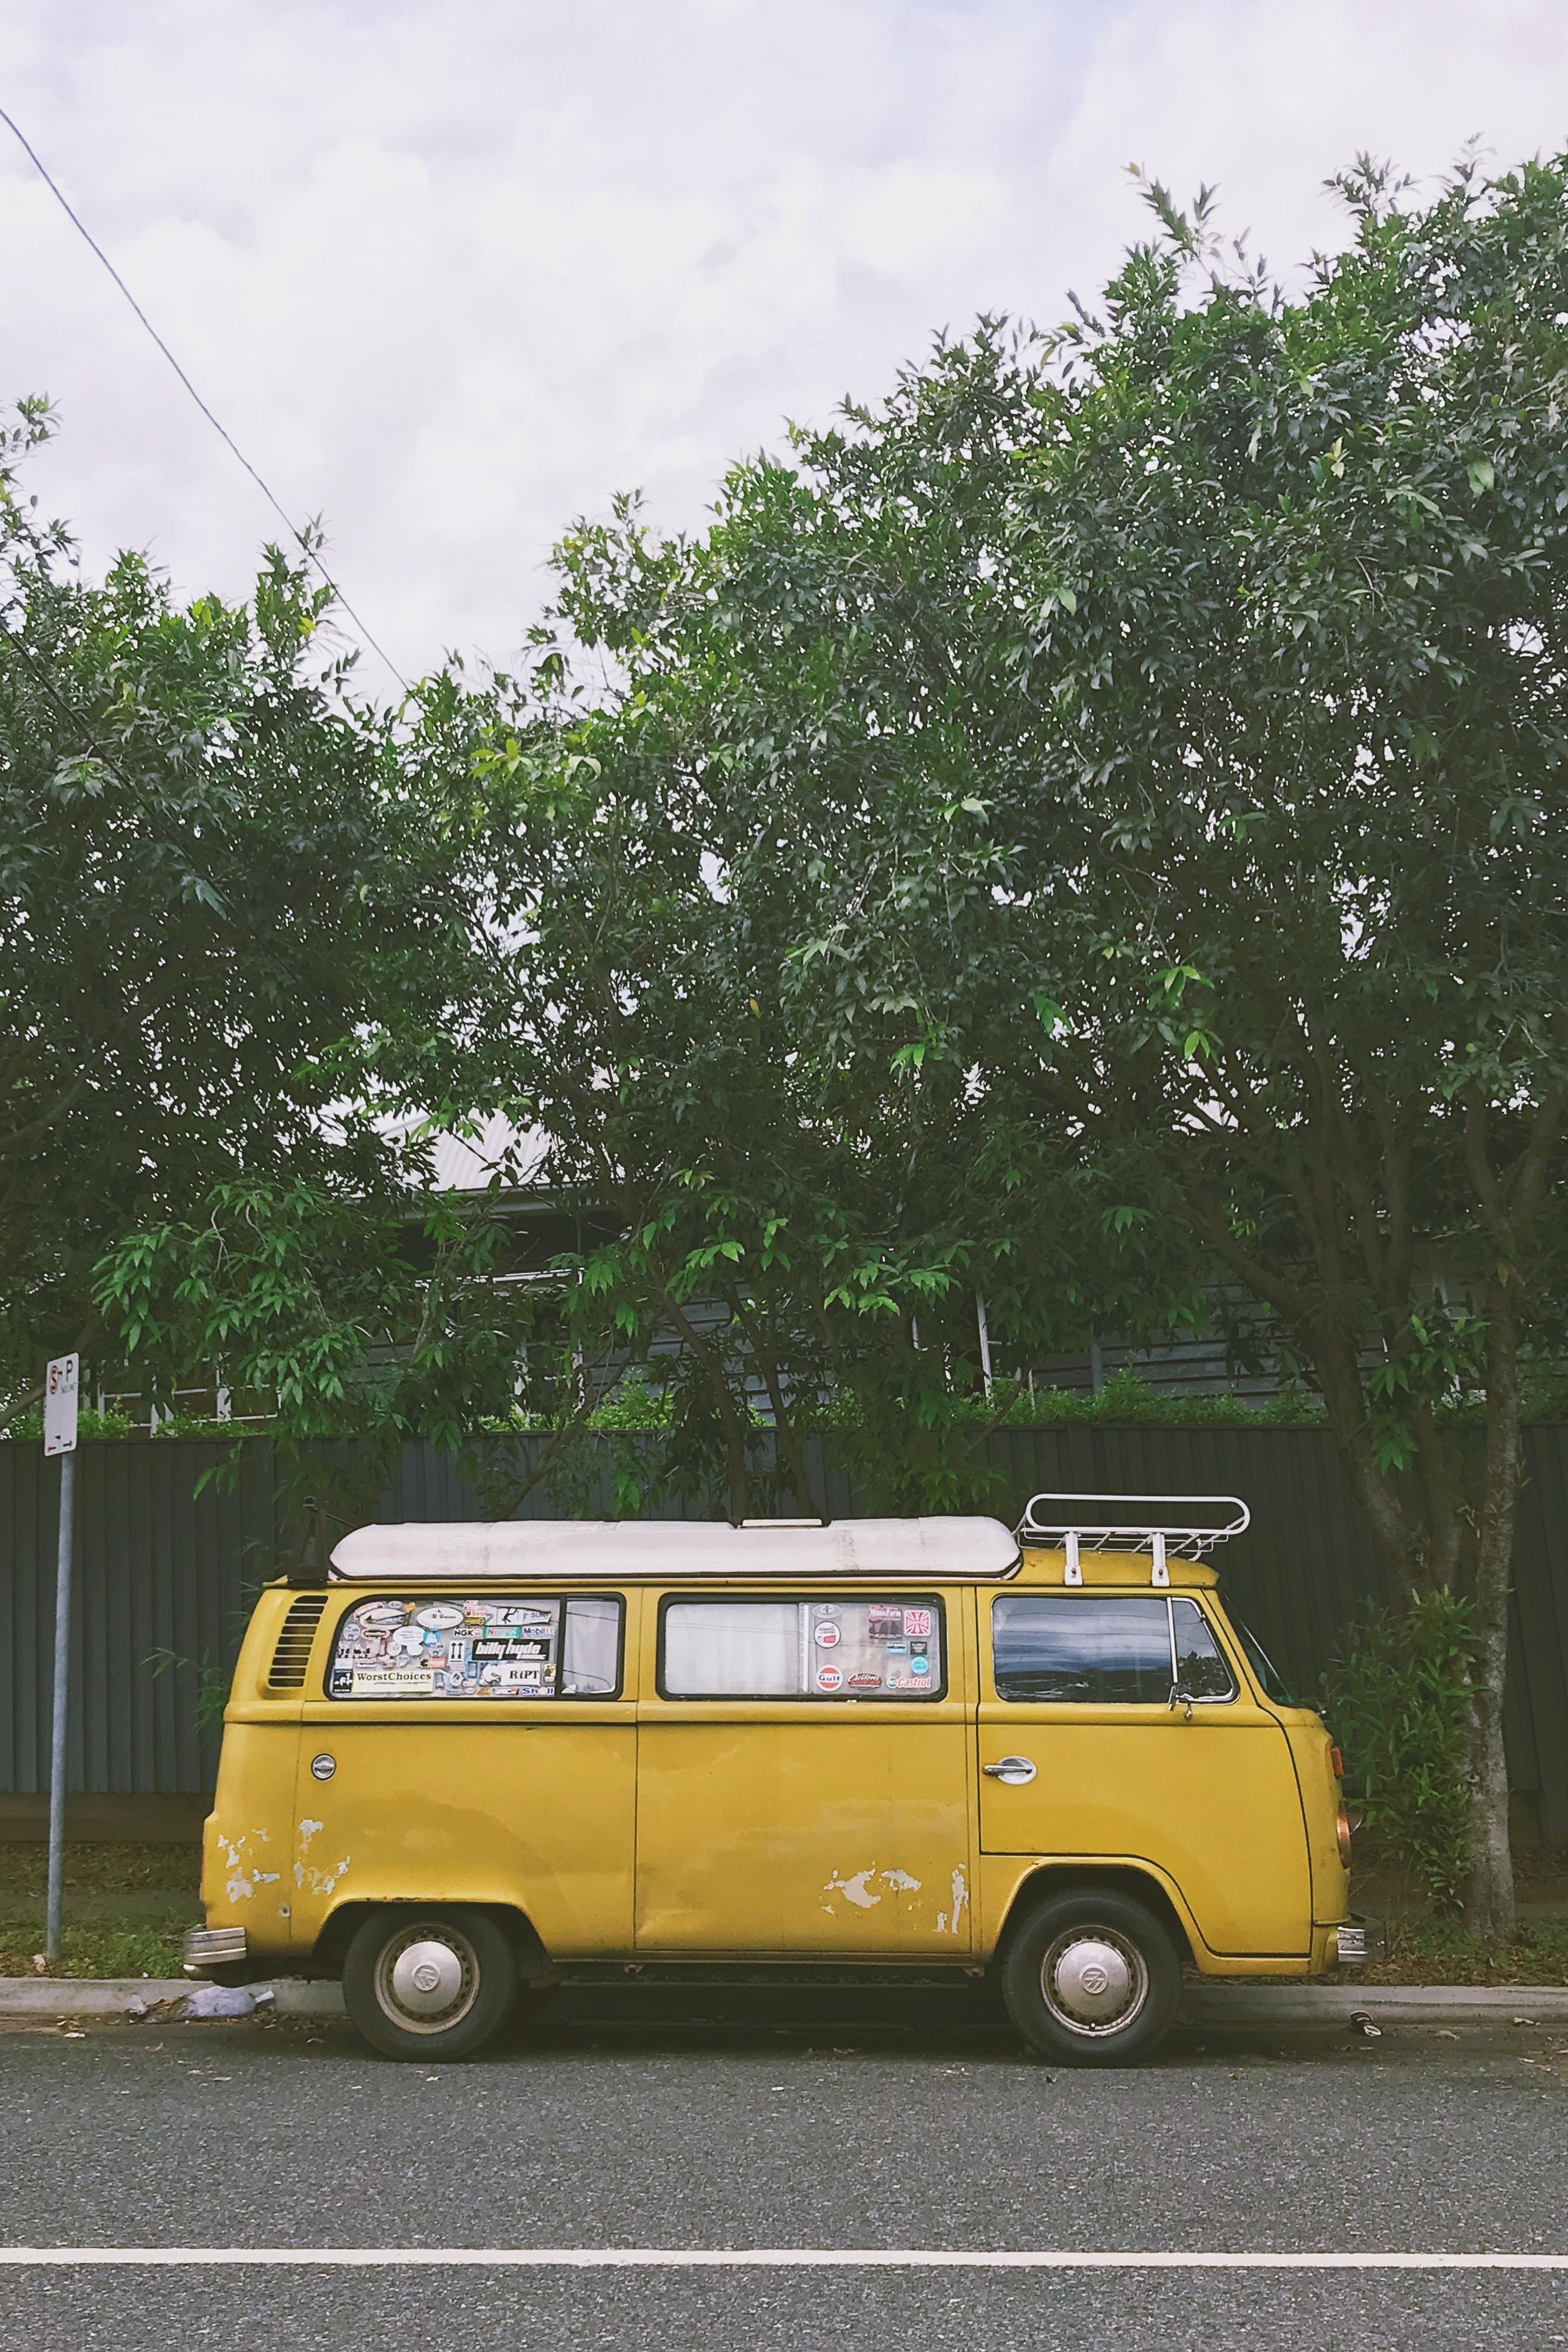 yellow van parked near trees